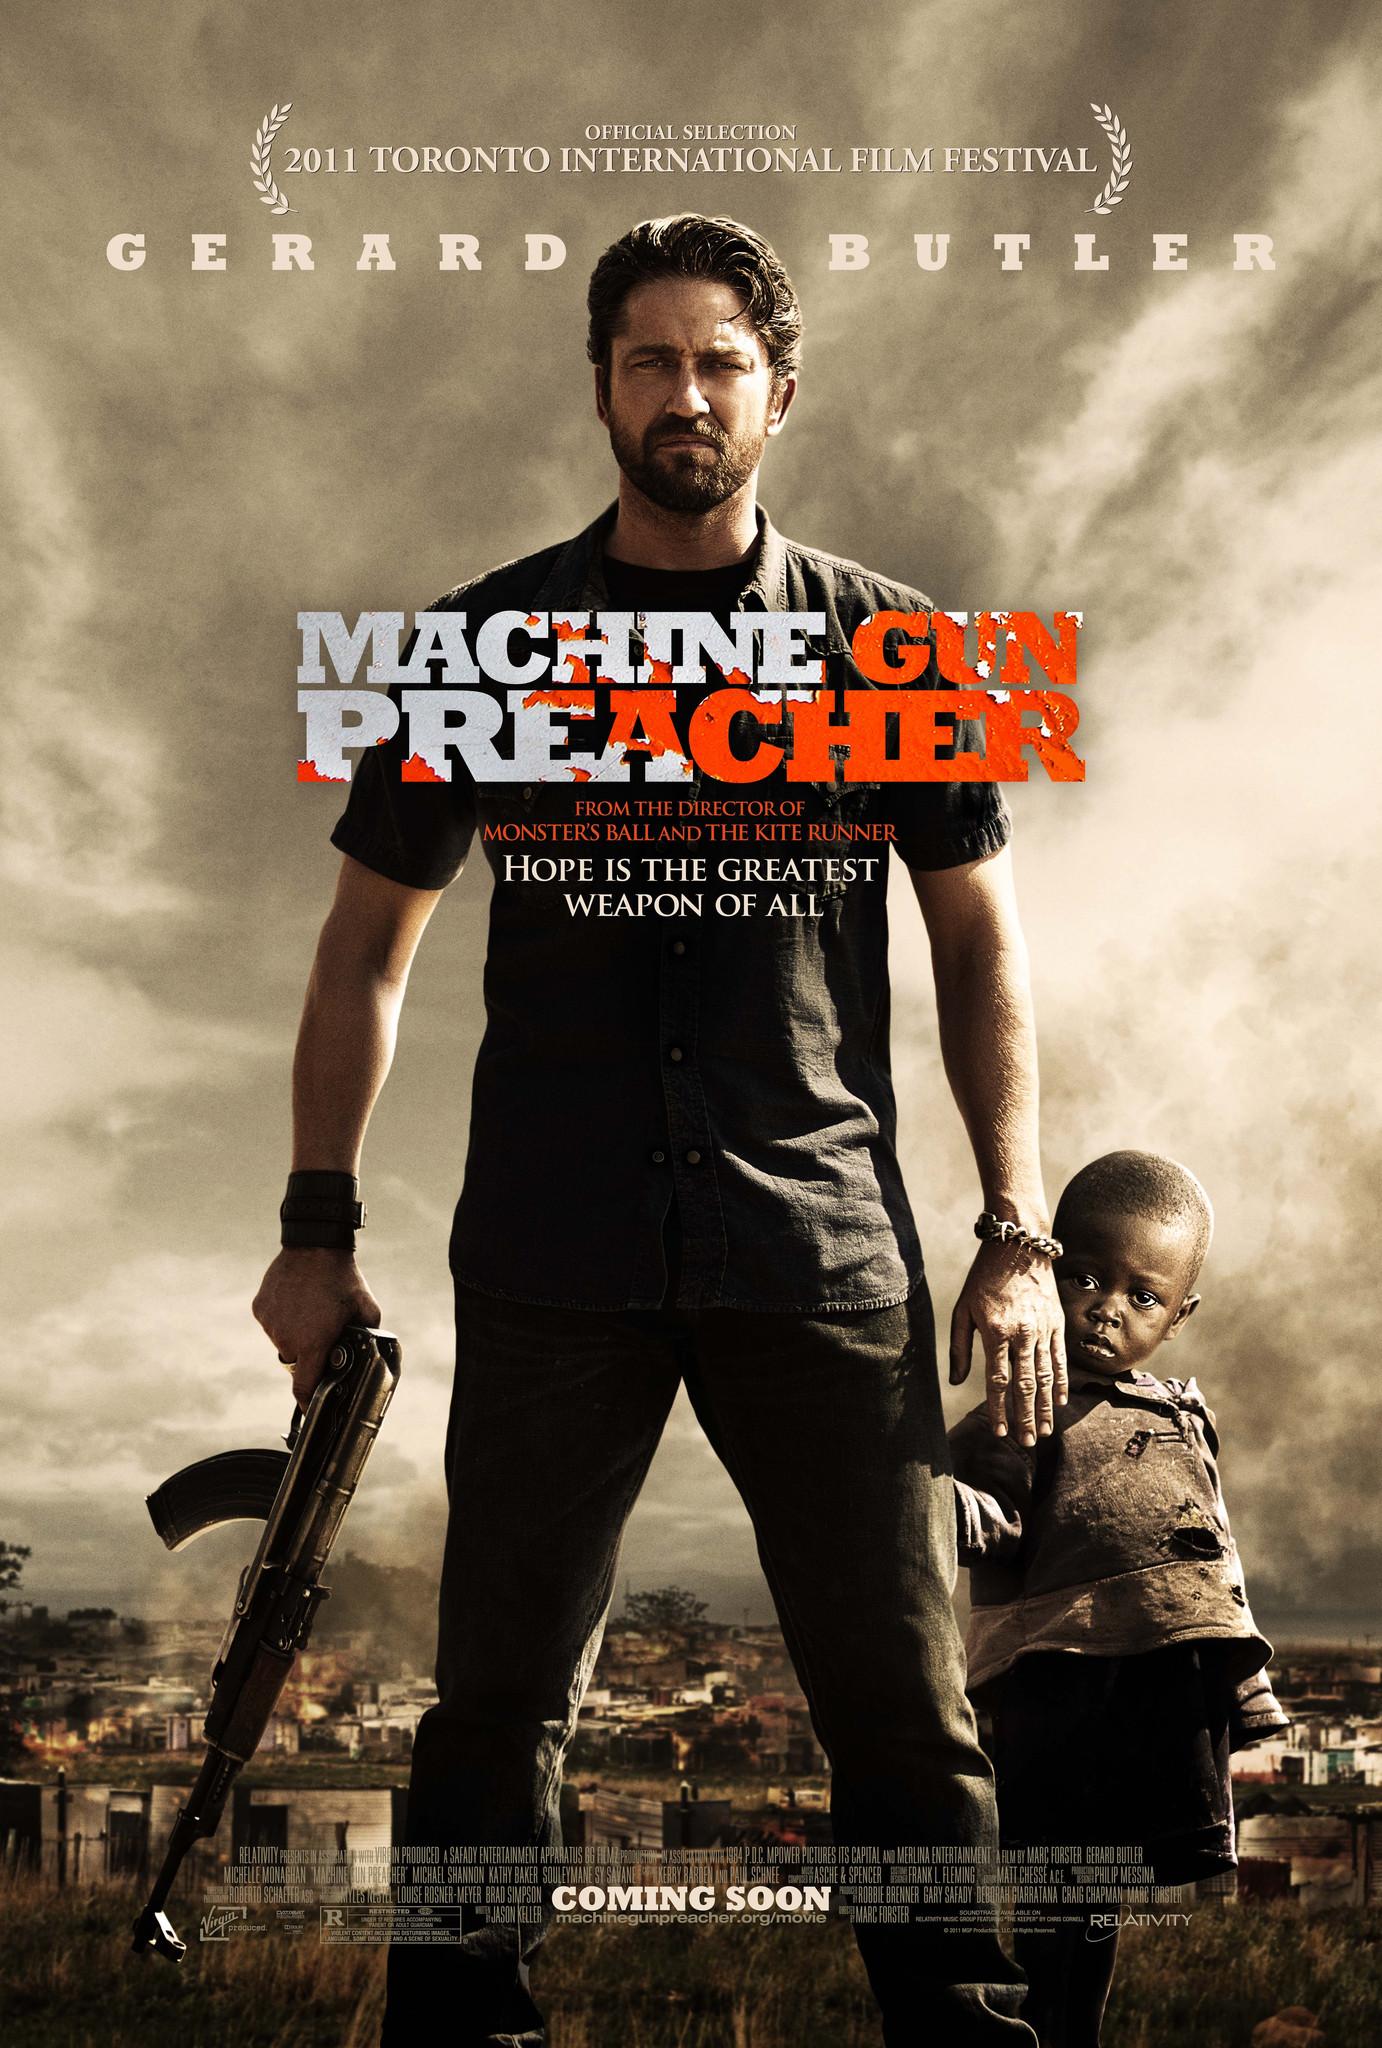 Machine Gun Preacher 2011 BluRay 1080p DTS-HD MA5.1 x265 10bit-BeiTai screenshots